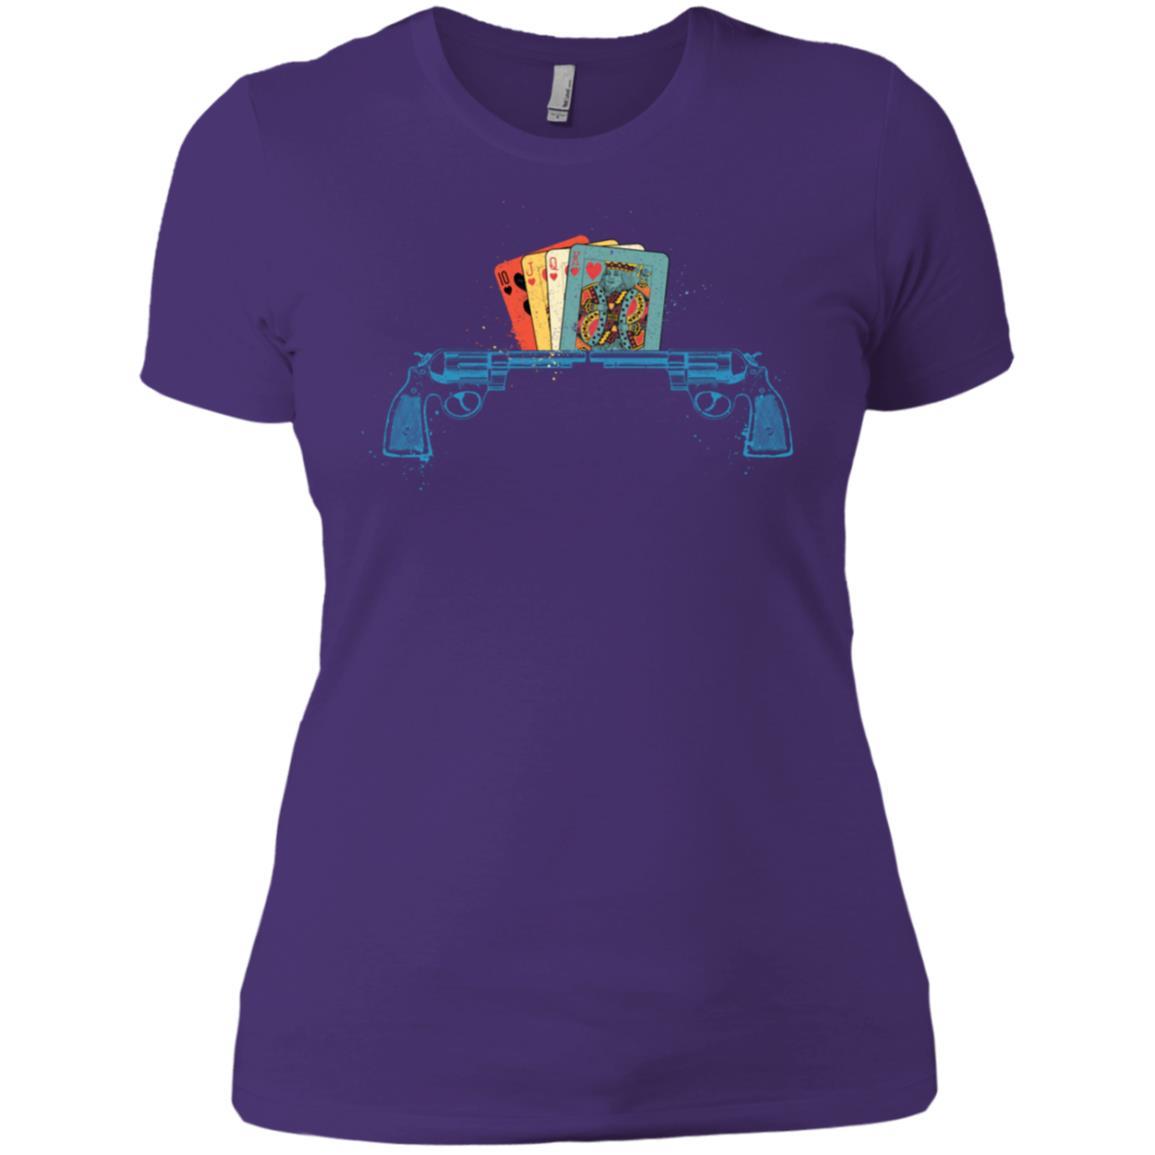 Card Player Gambling Gift Gun & Cards Poker Player Women Short Sleeve